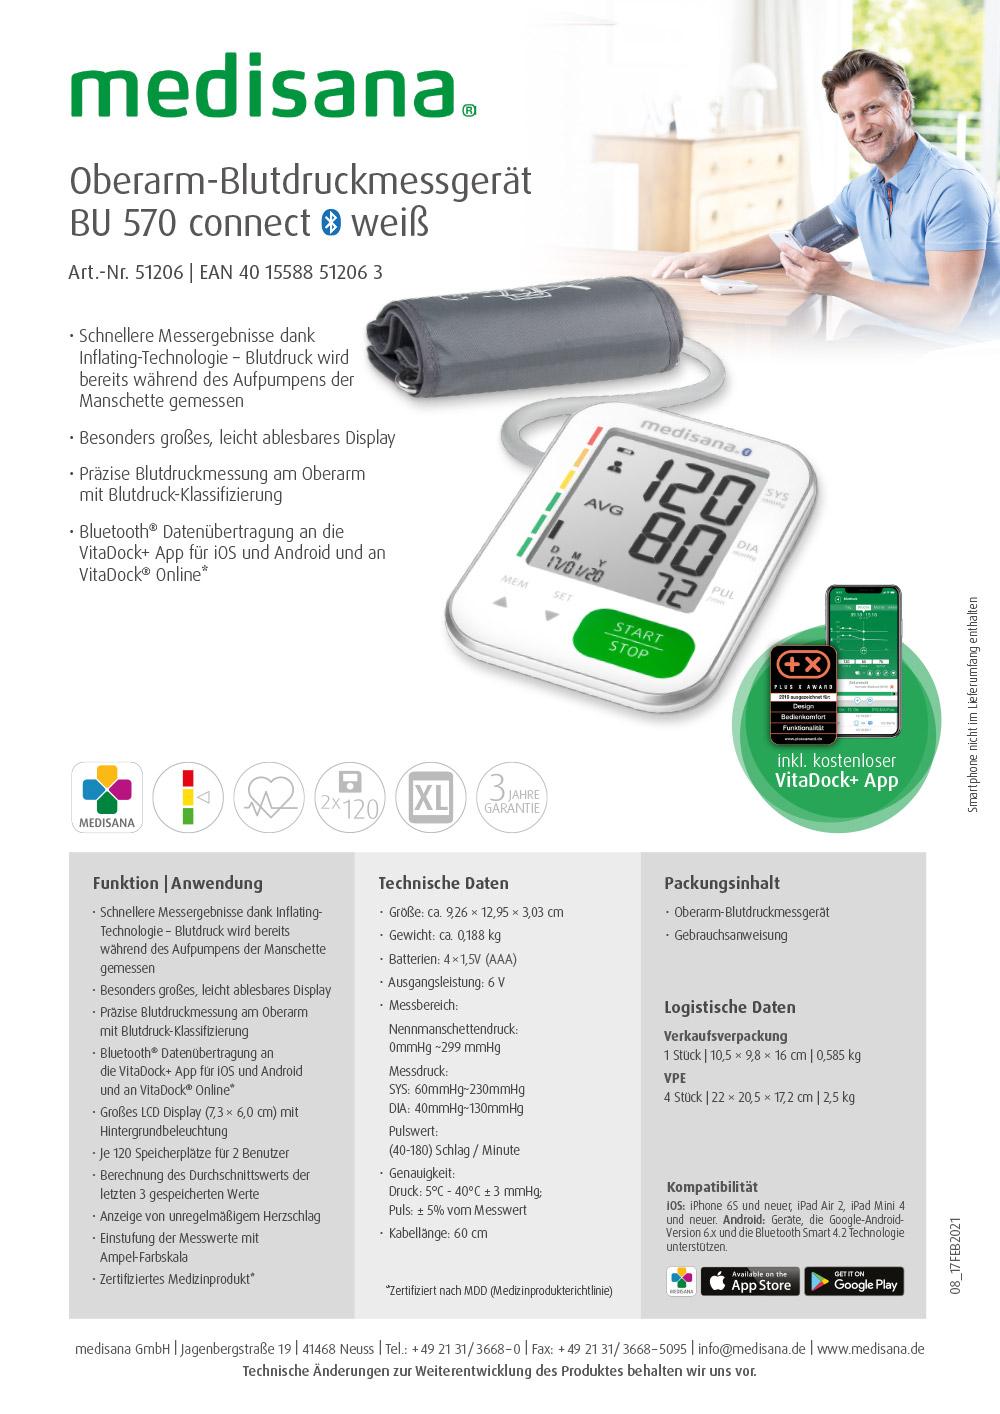 PB Oberarm-Blutdruckmessgerät BU 570 connect